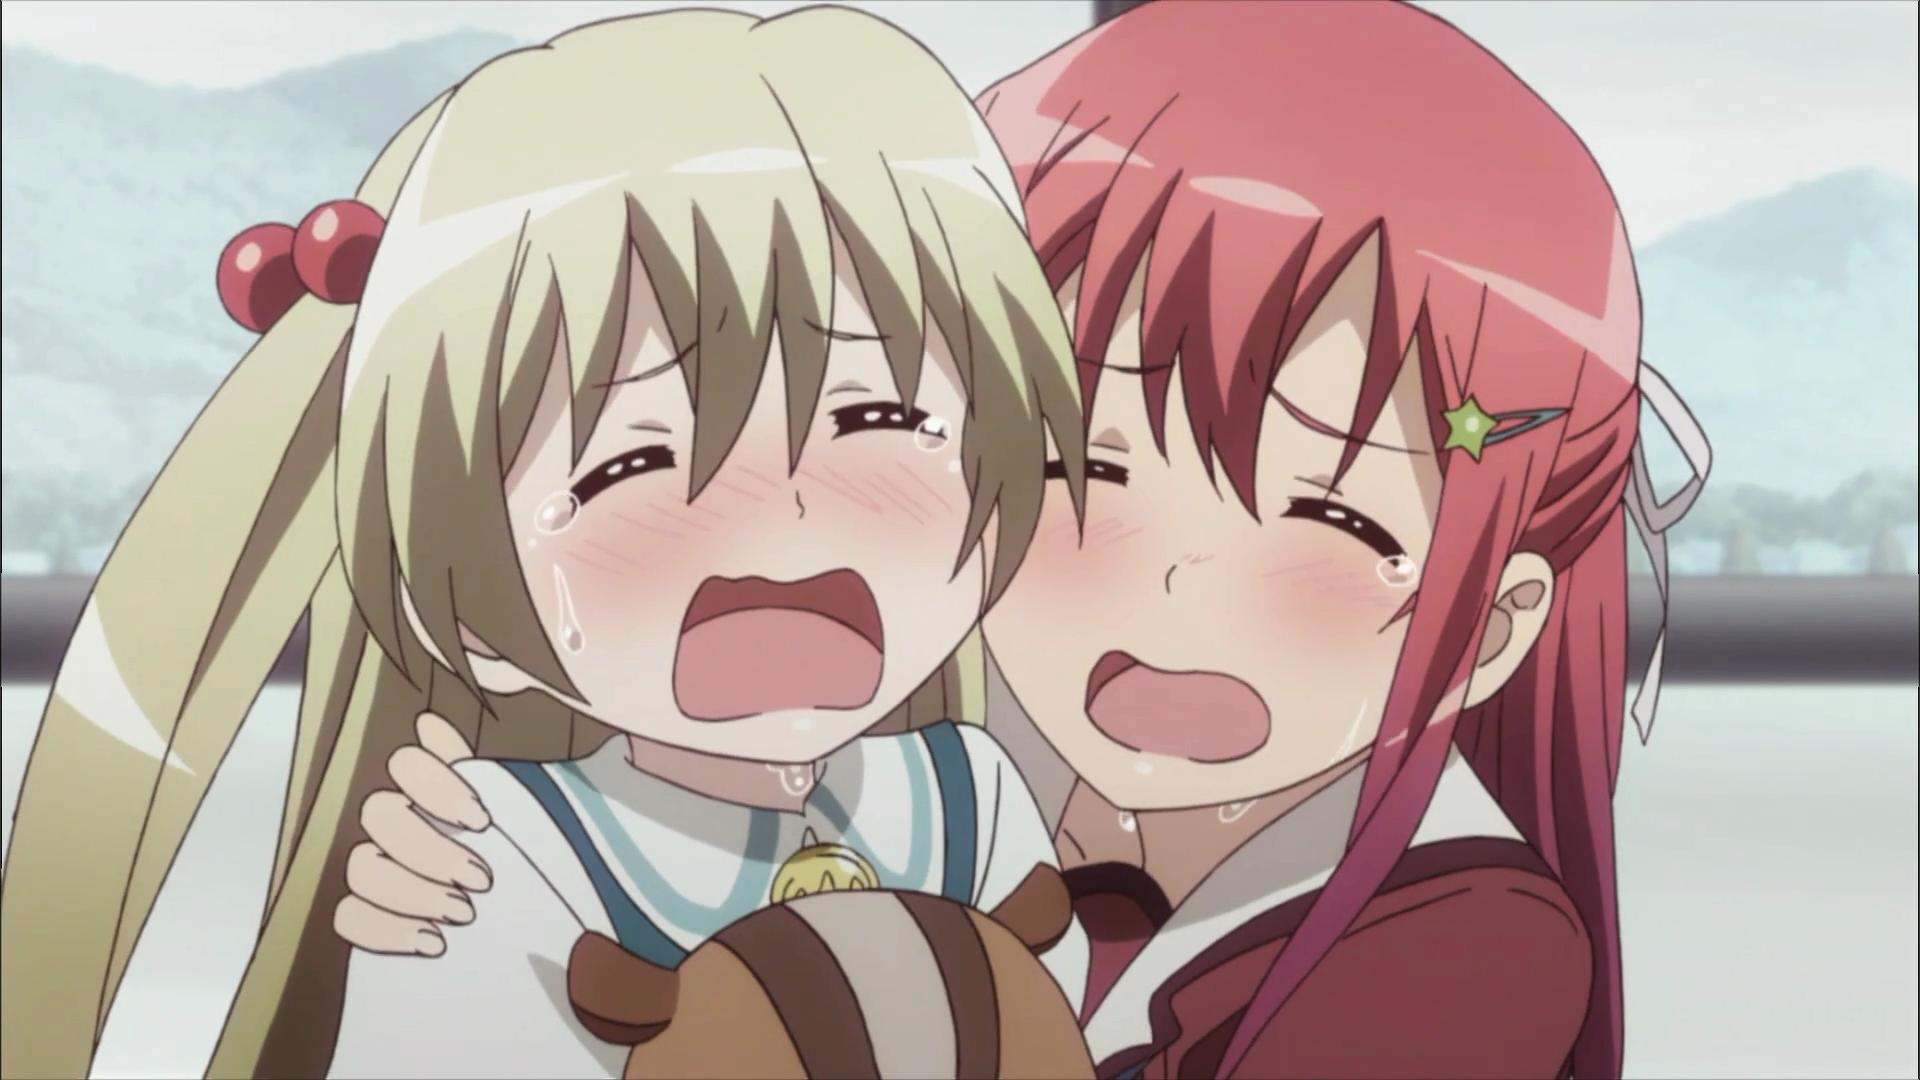 Tomoyo e Chifuyu choram o fim da temporada